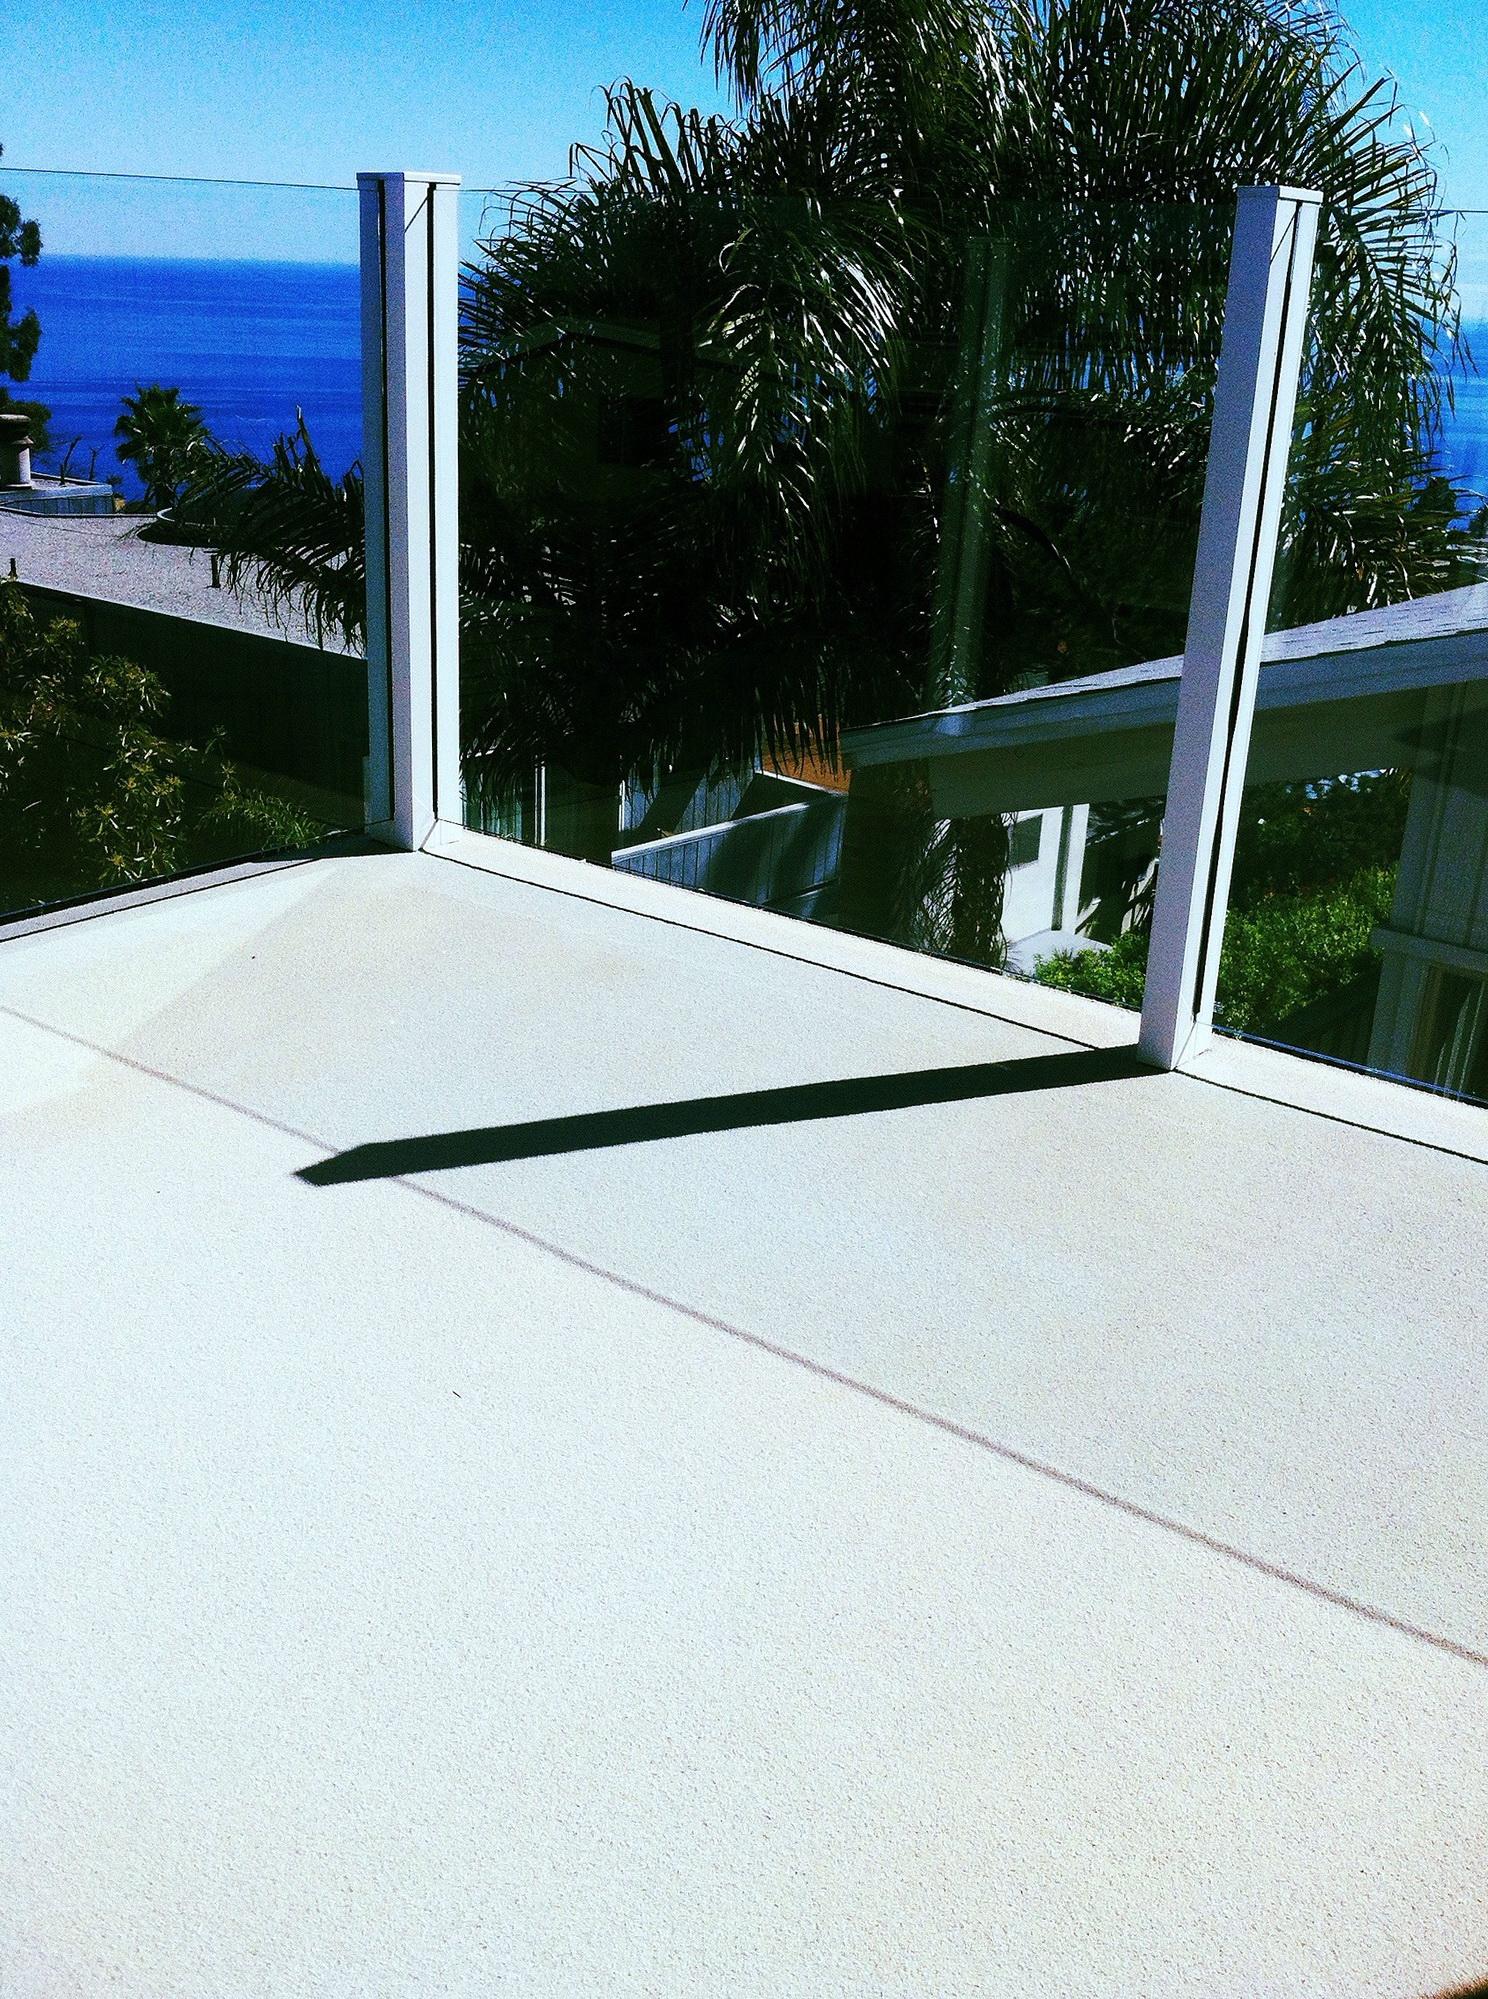 Waterproof Deck Coating For Plywood